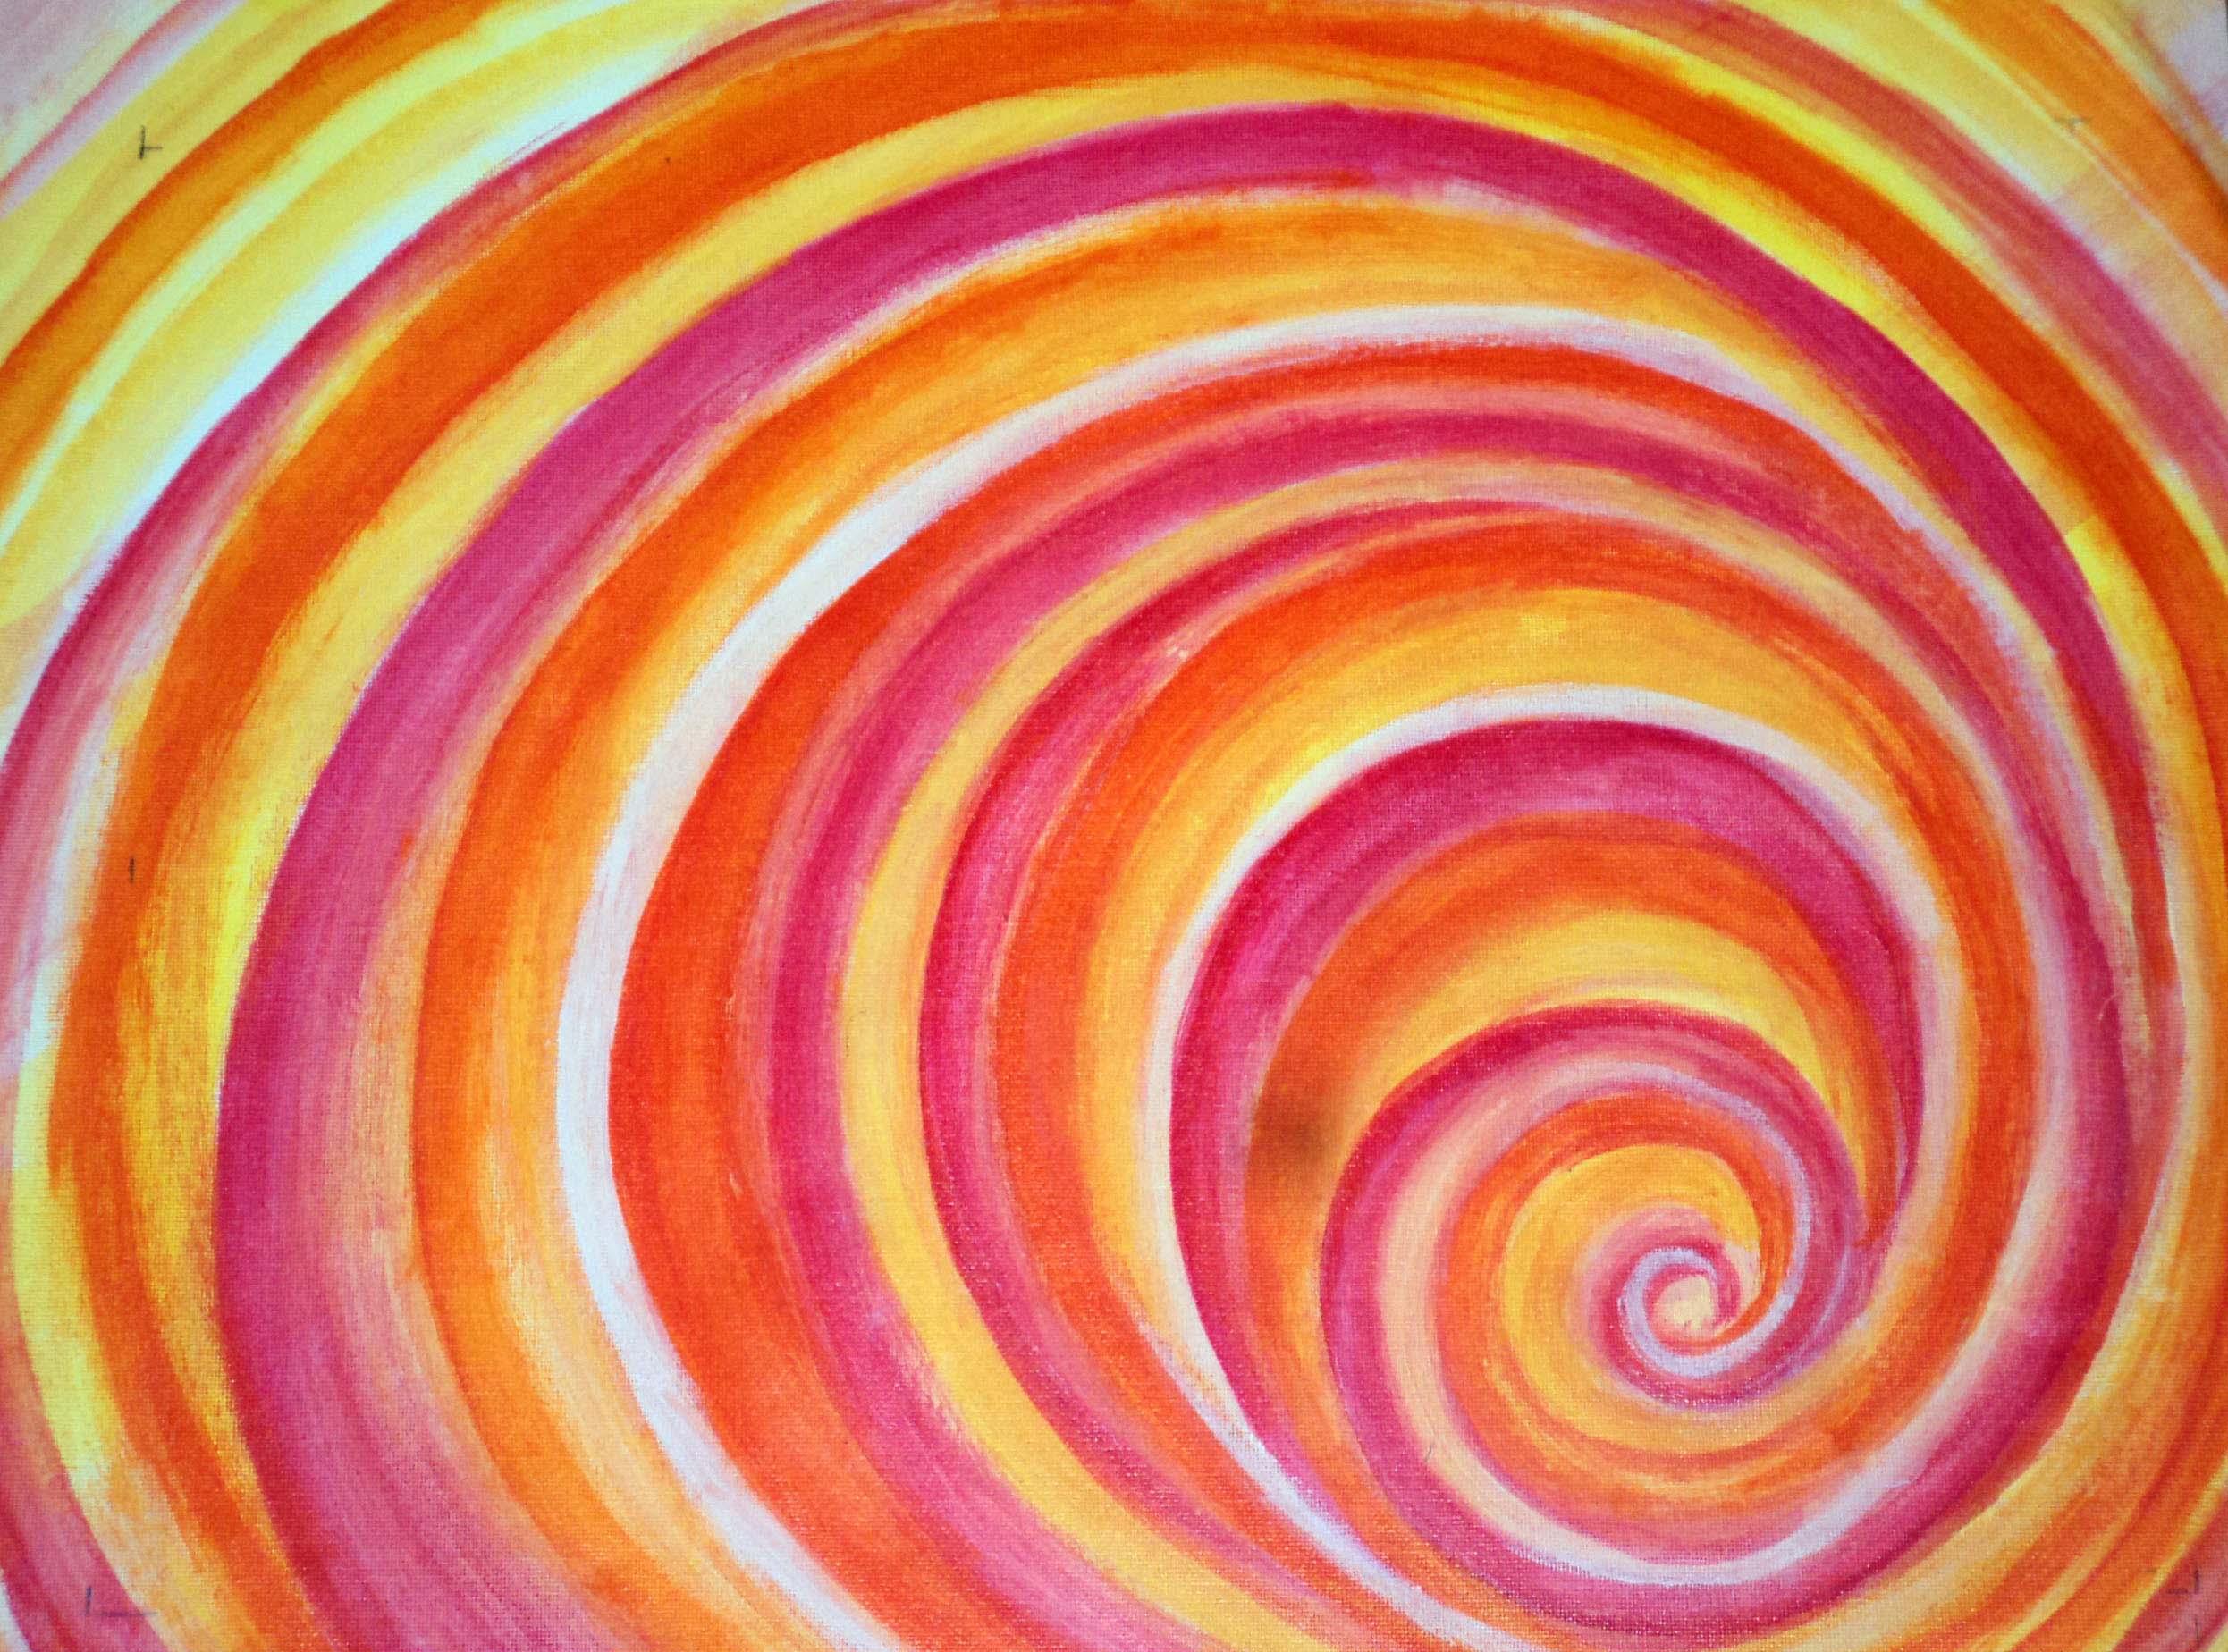 Colorful And Playful Fibonacci Lollipop Swirl Creative